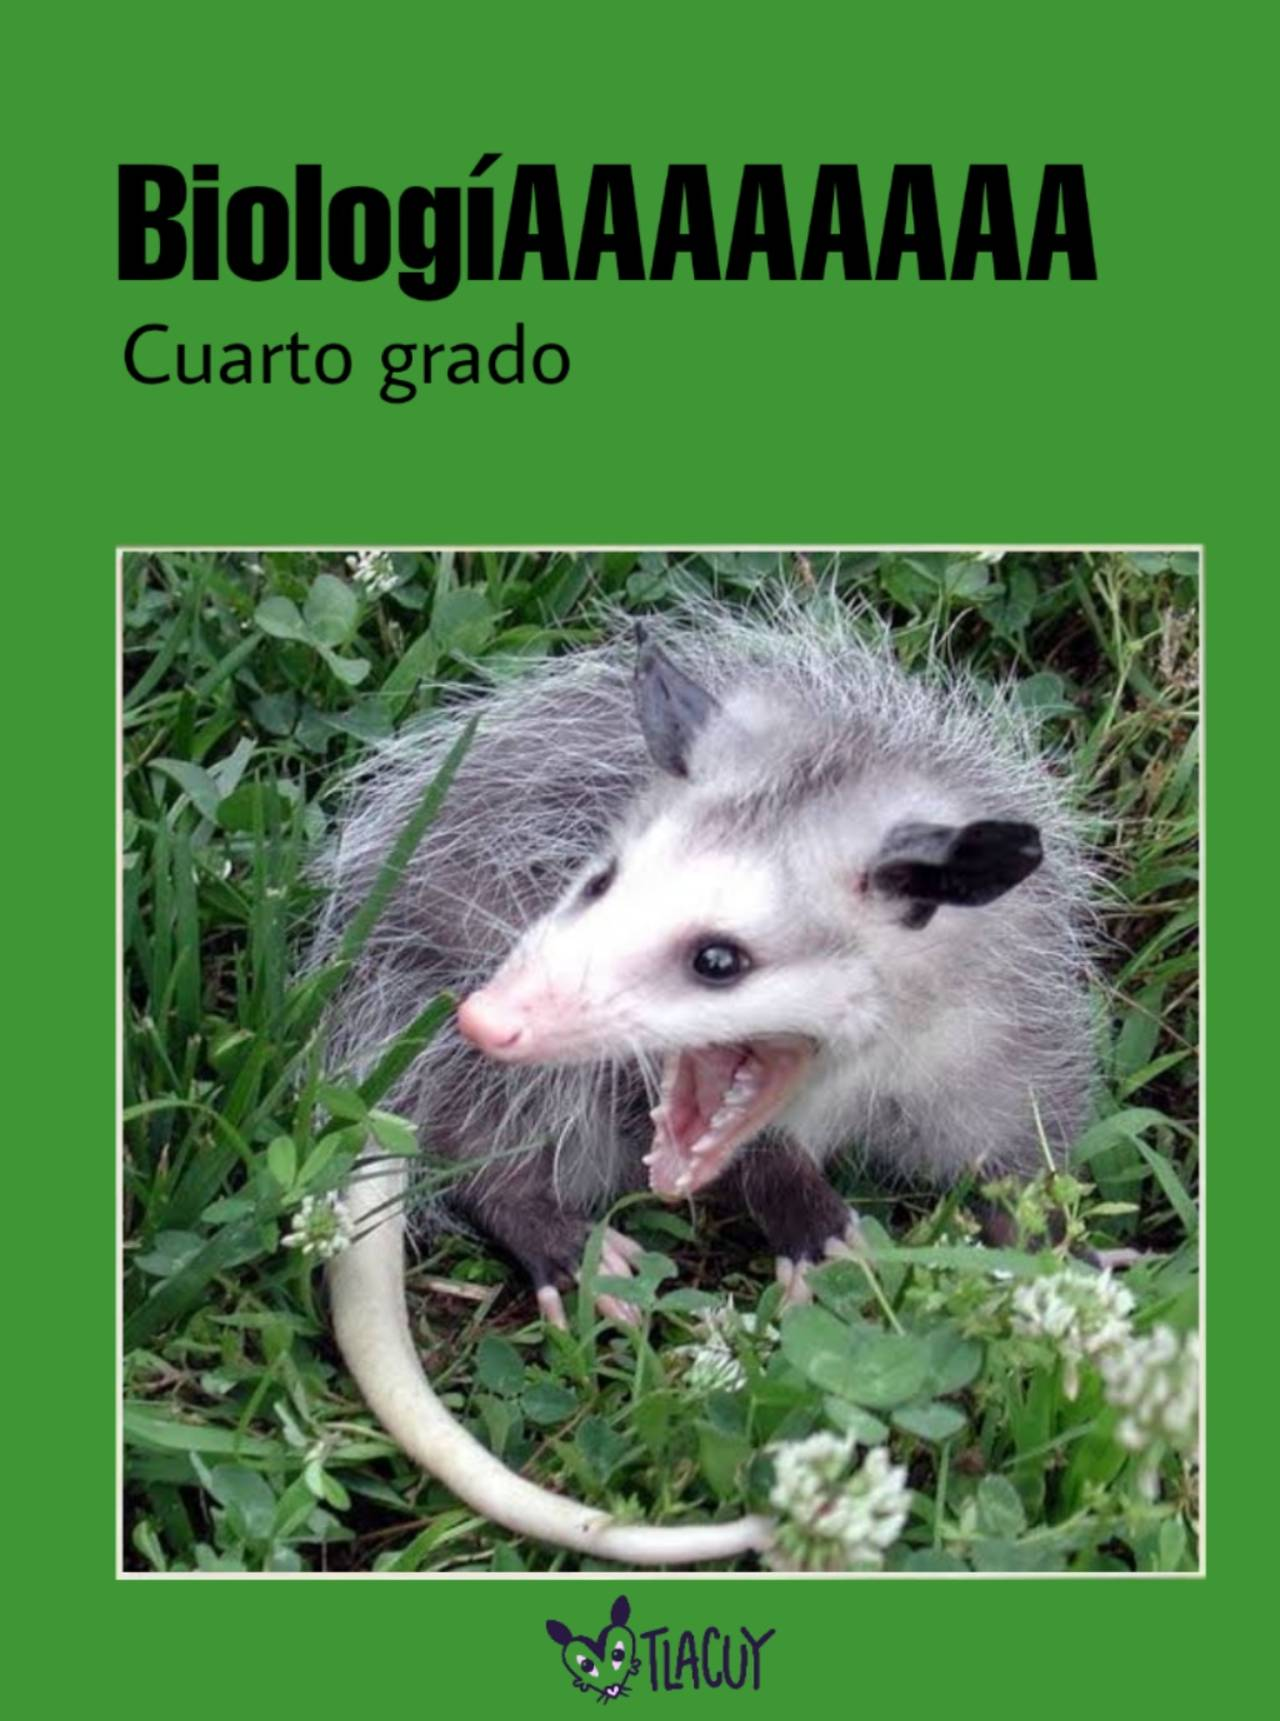 memes libros de texto gratuitos primaria sep